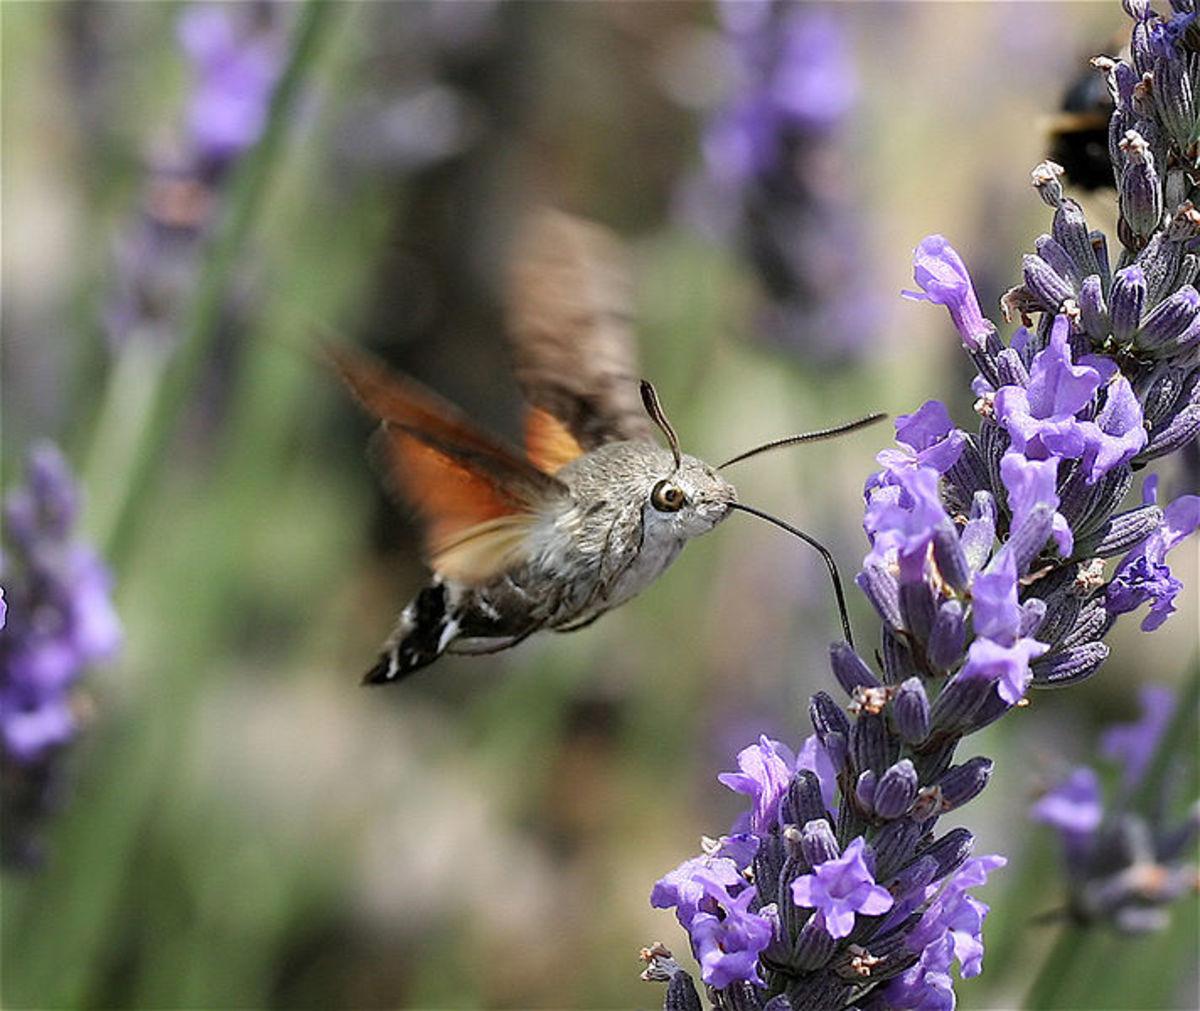 Hummingbird Hawk Moth. Photo by IronChris.